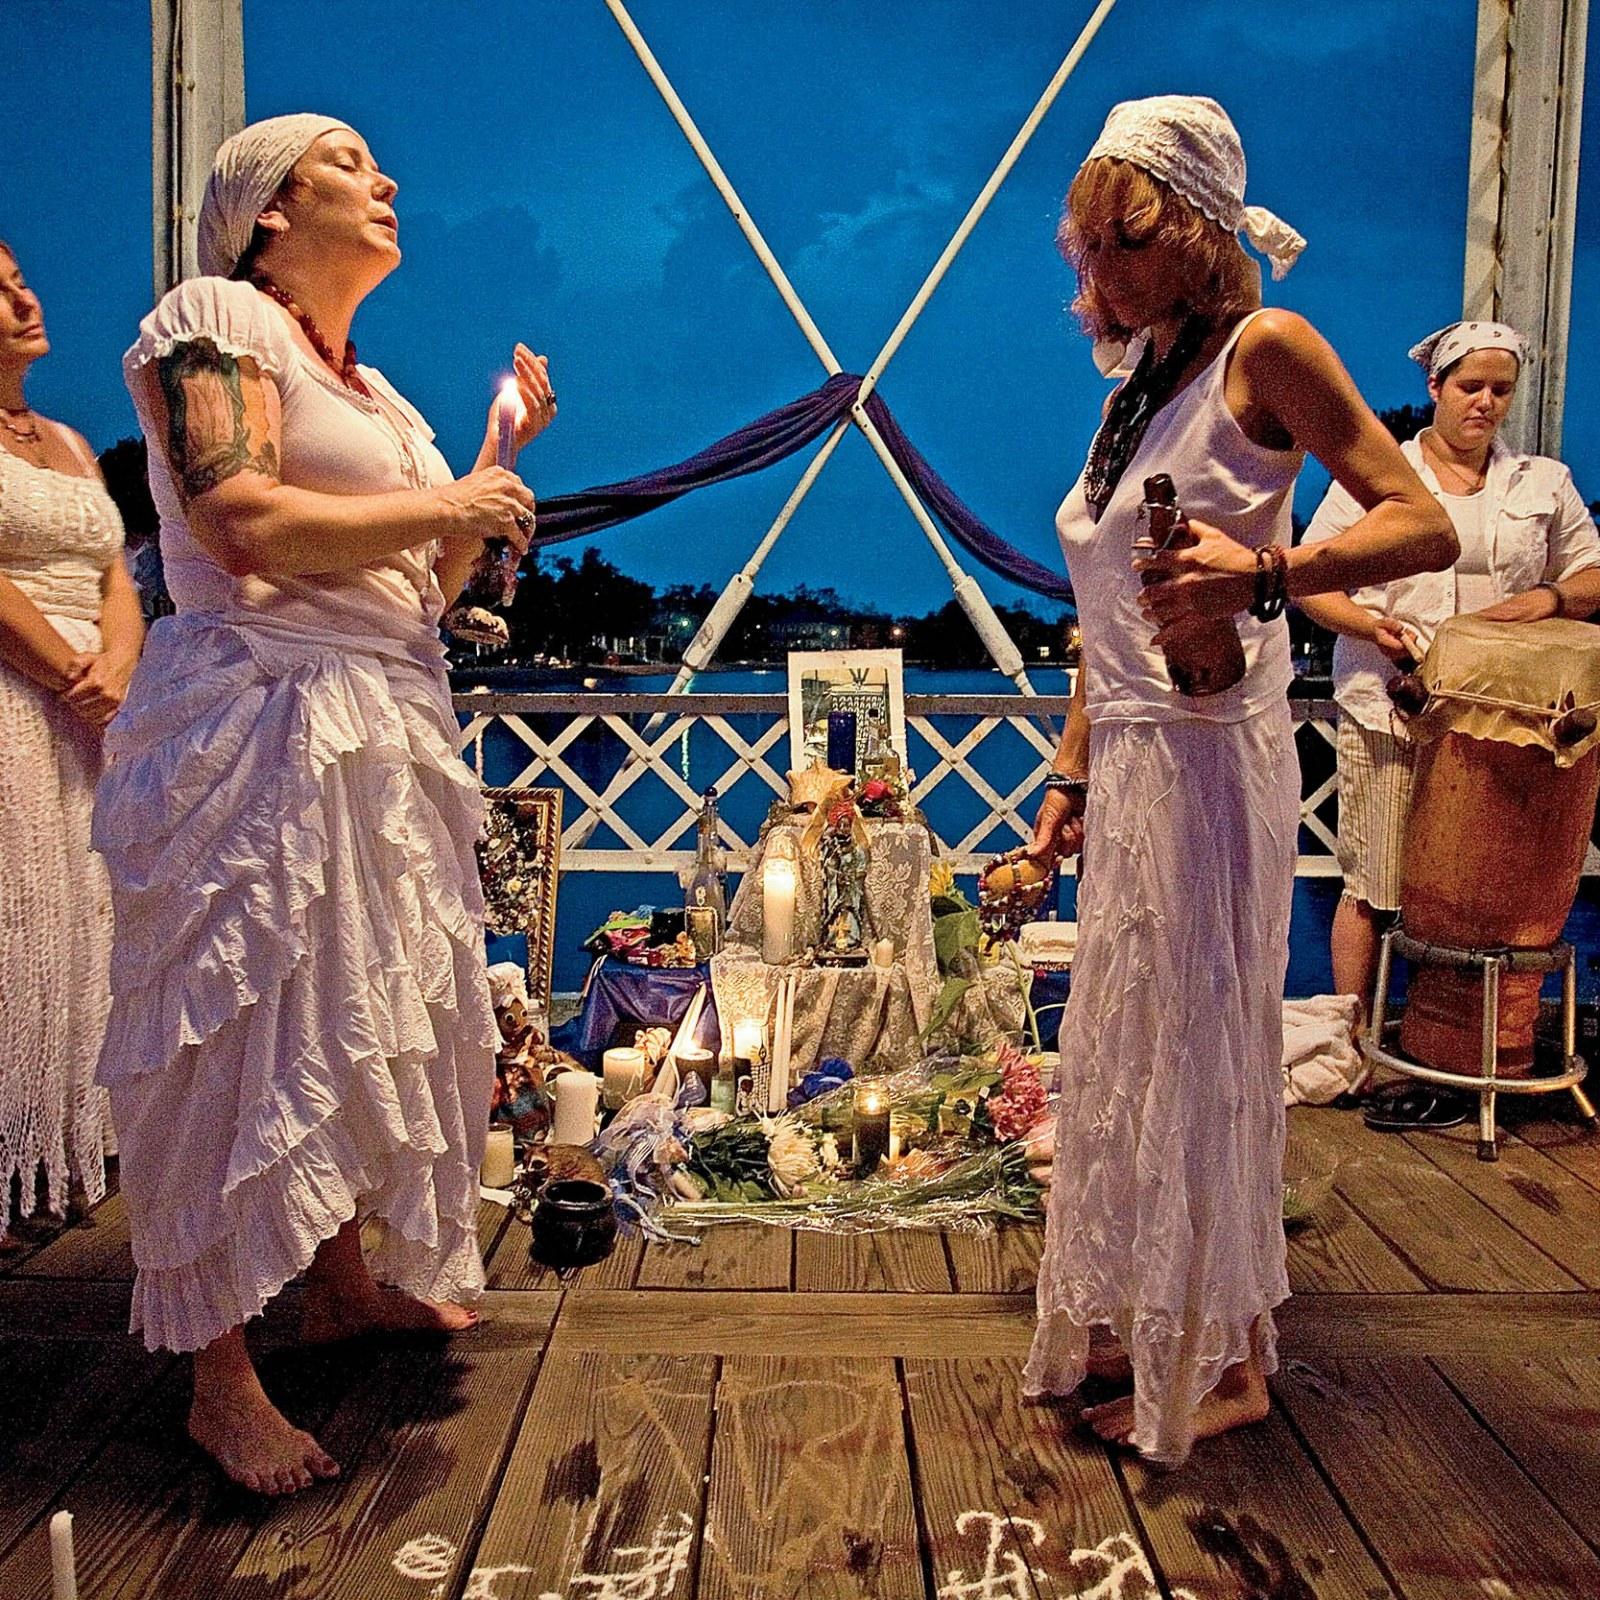 Voodoo Is Rebounding in New Orleans After Hurricane Katrina